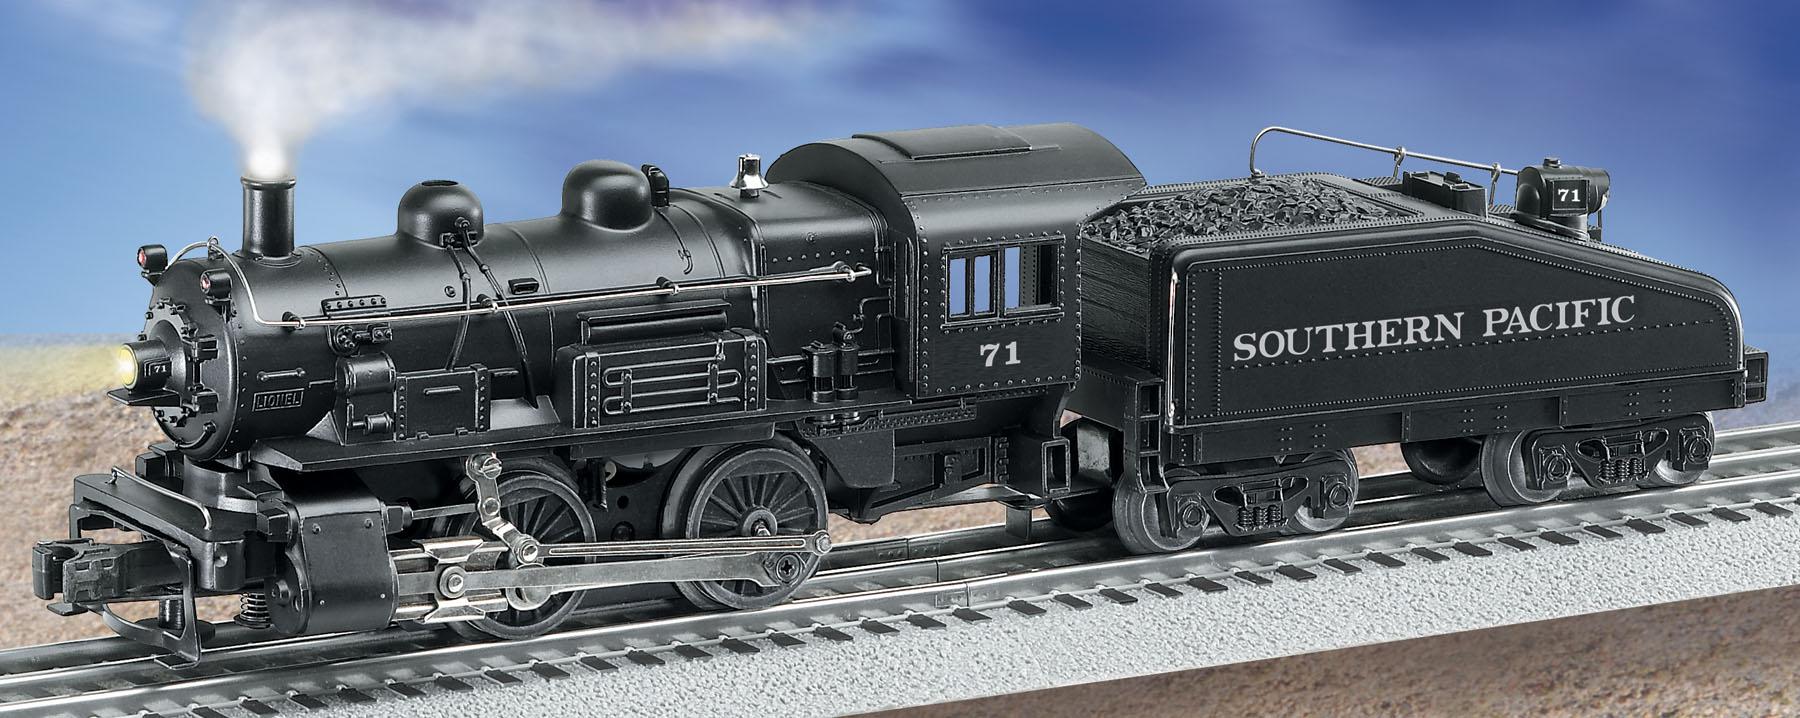 Locomotive Parts Catalog : Southern pacific steam locomotive